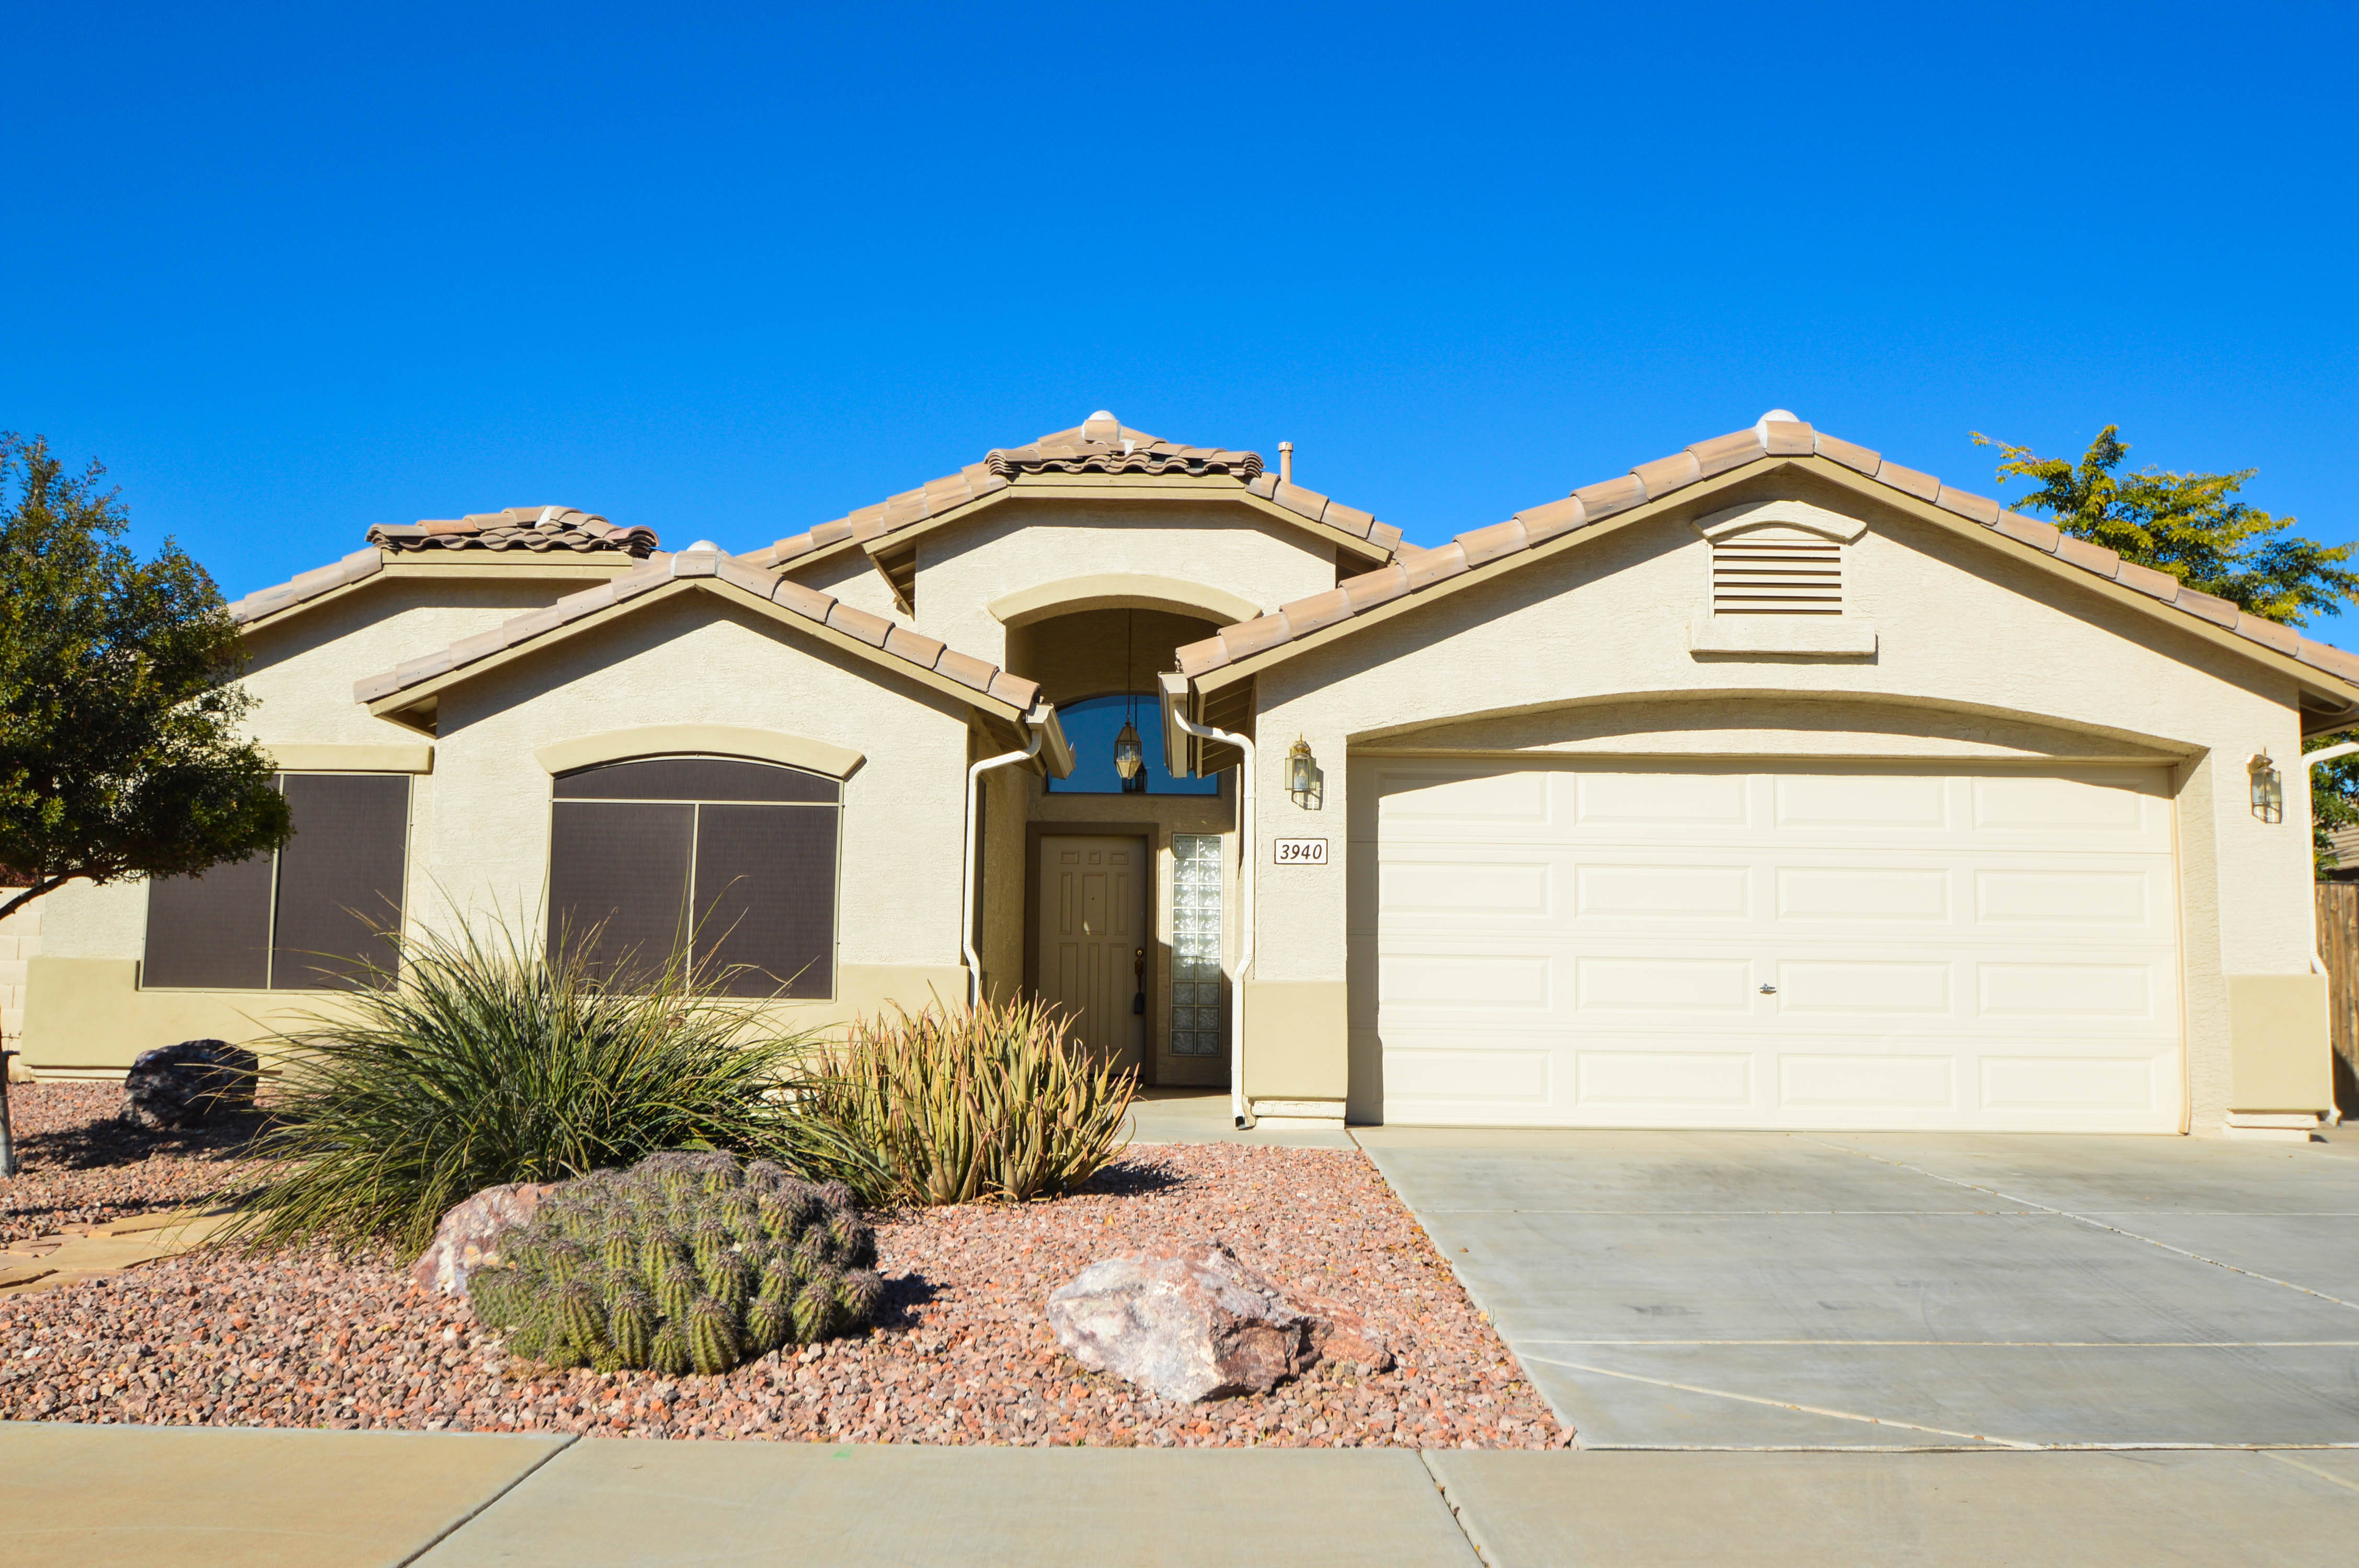 pool home for sale in coronado ranch in gilbert arizona